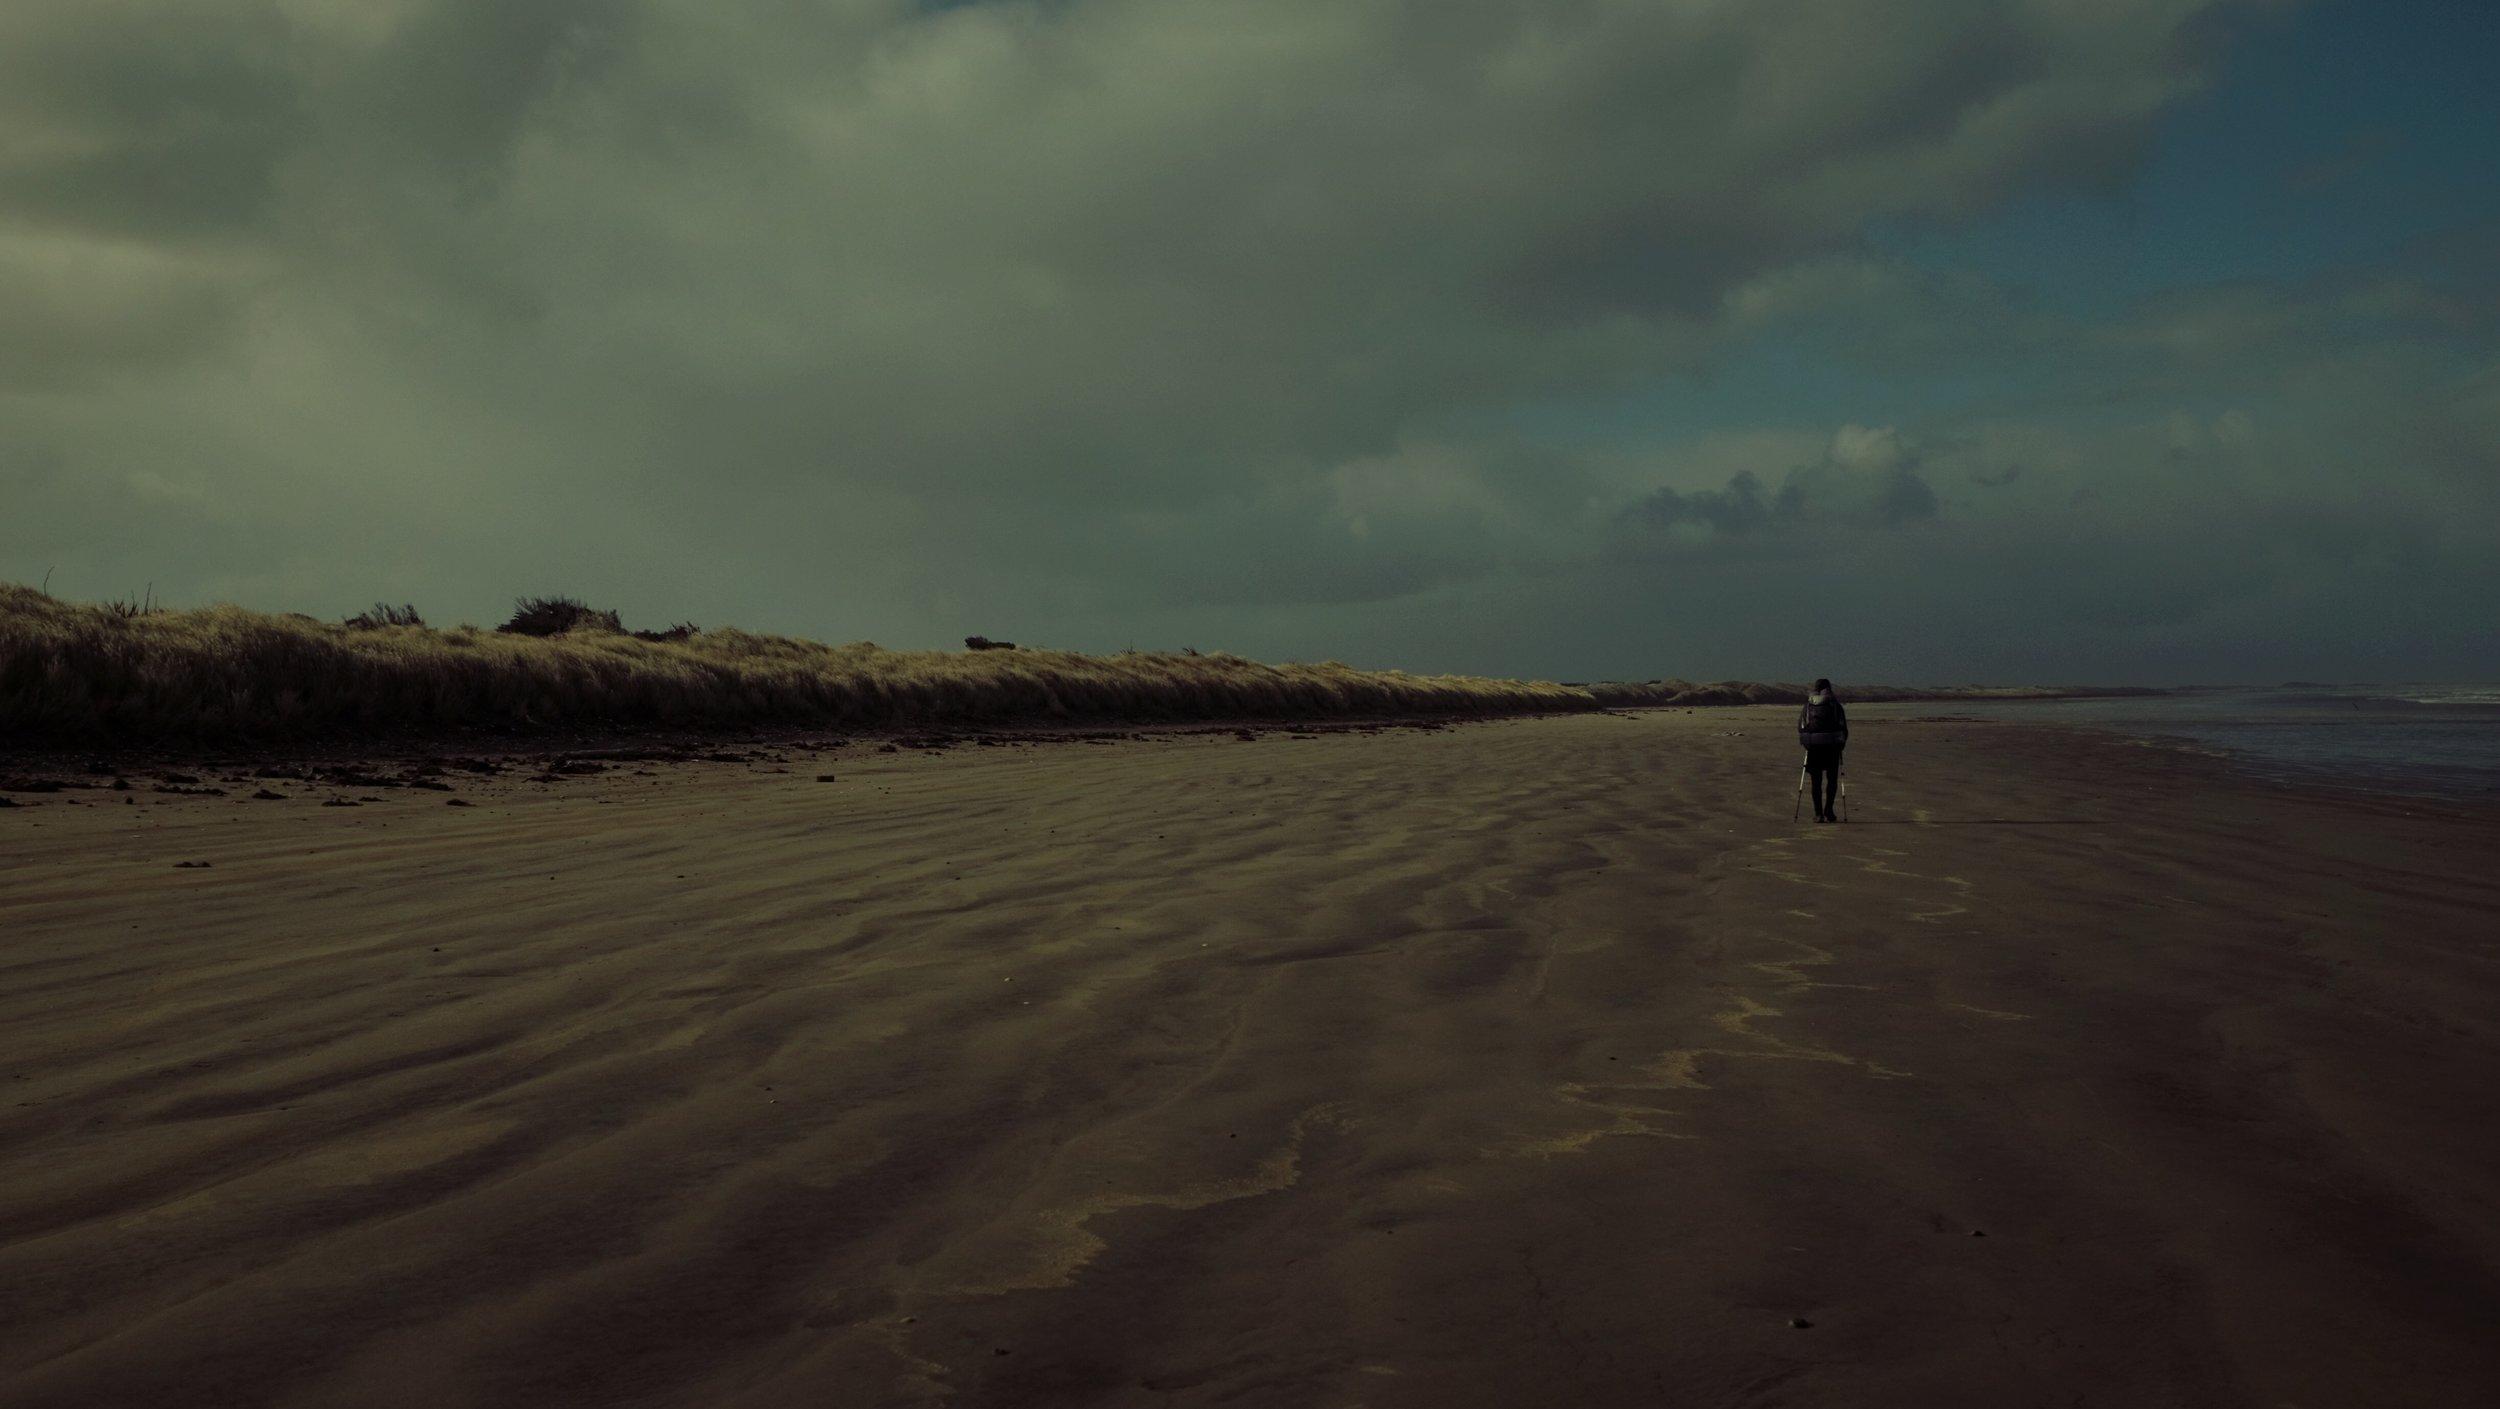 One last never-ending beach.